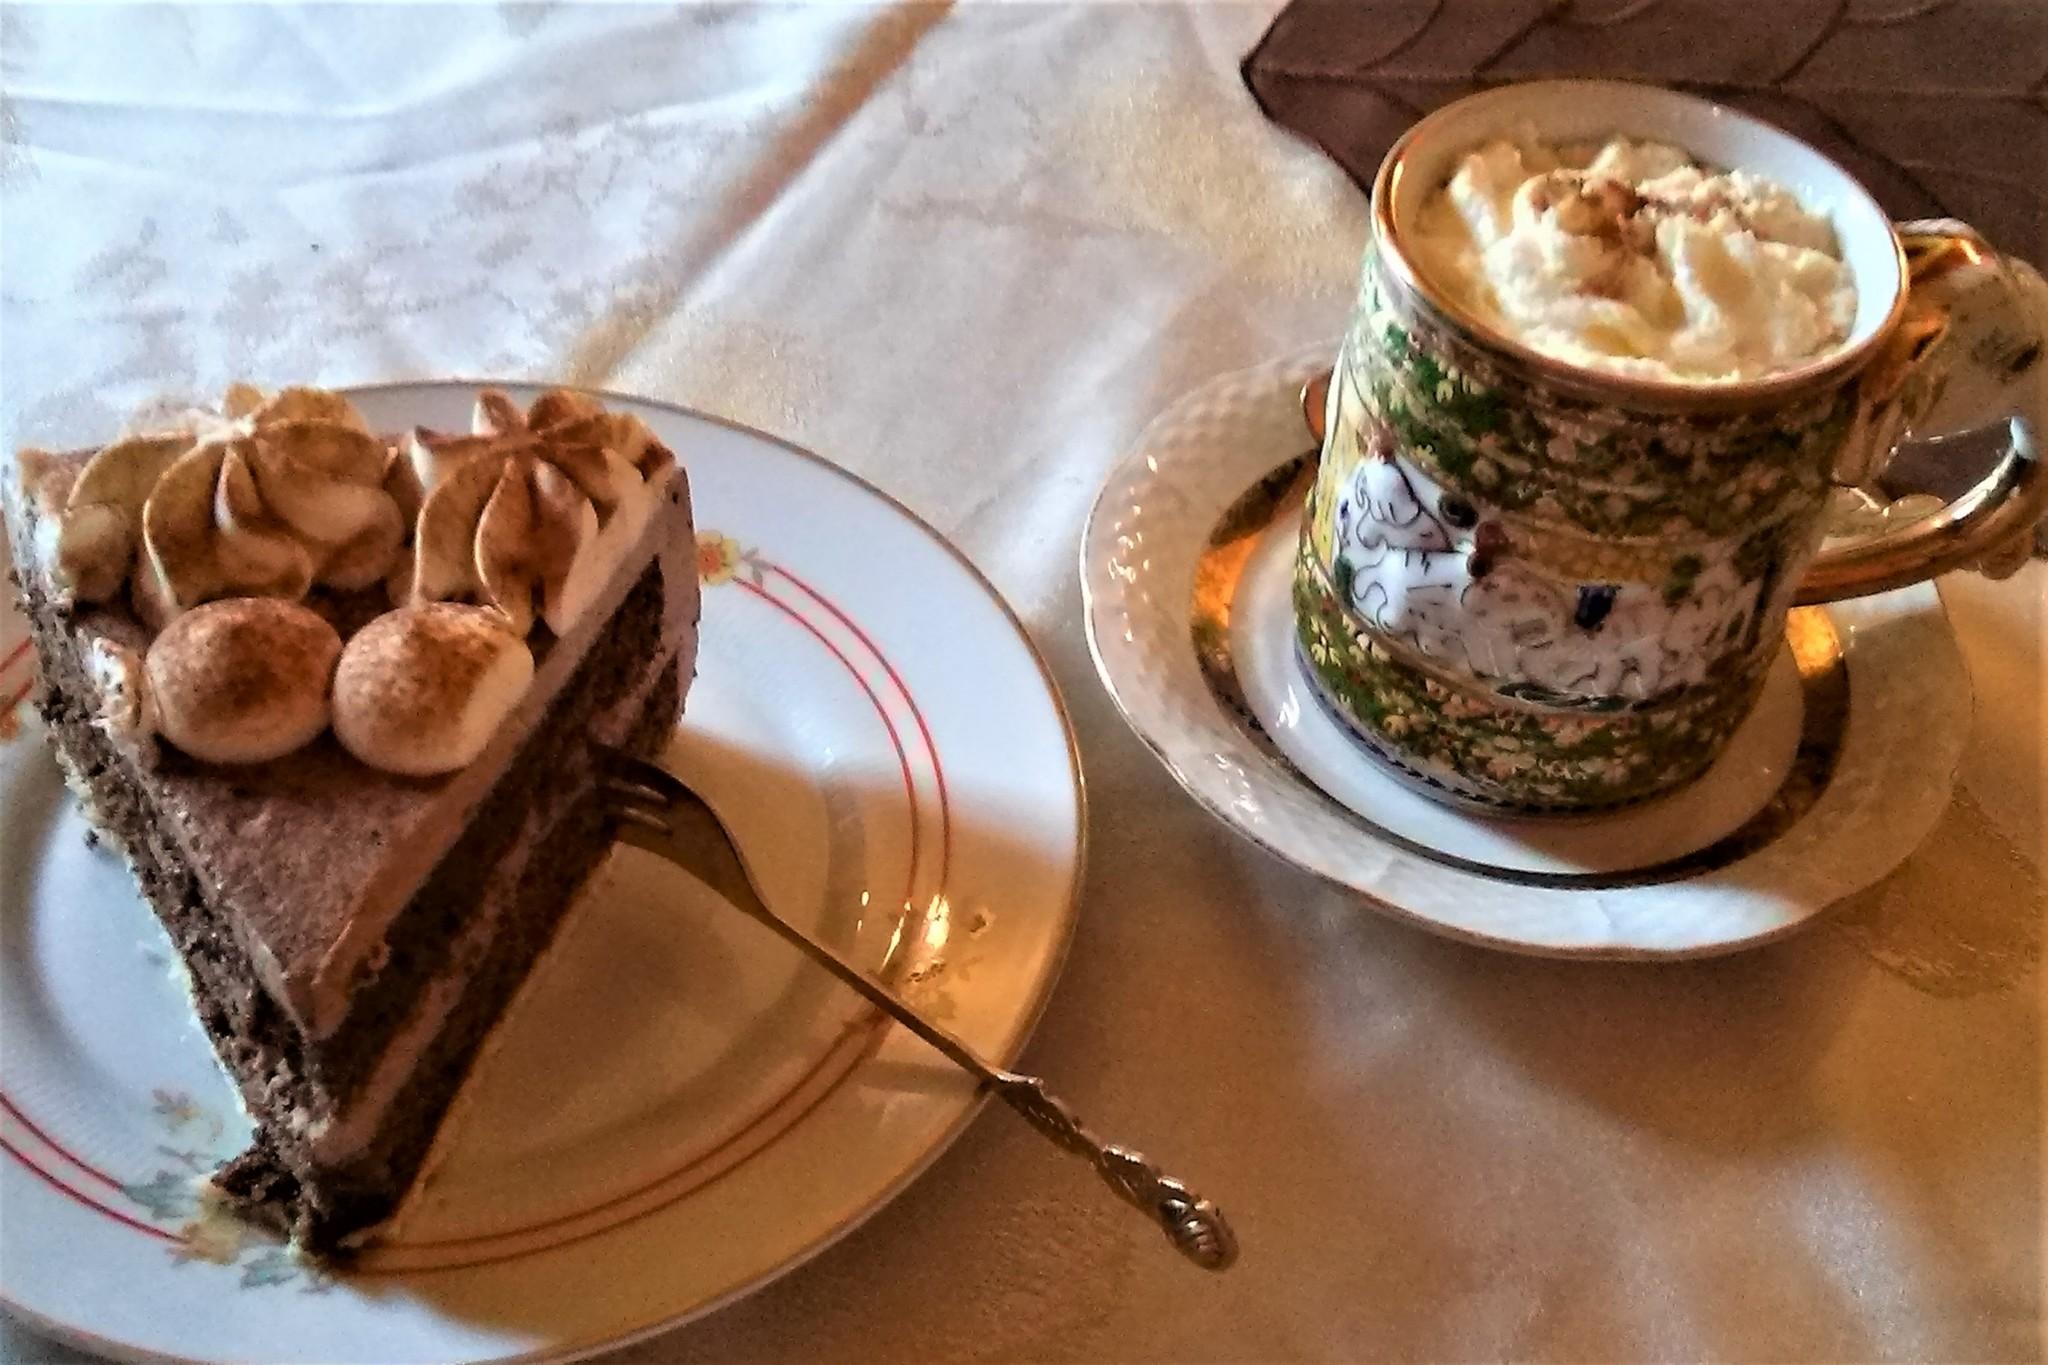 Heiße Schokolade kann man im Burgcafé gut trinken